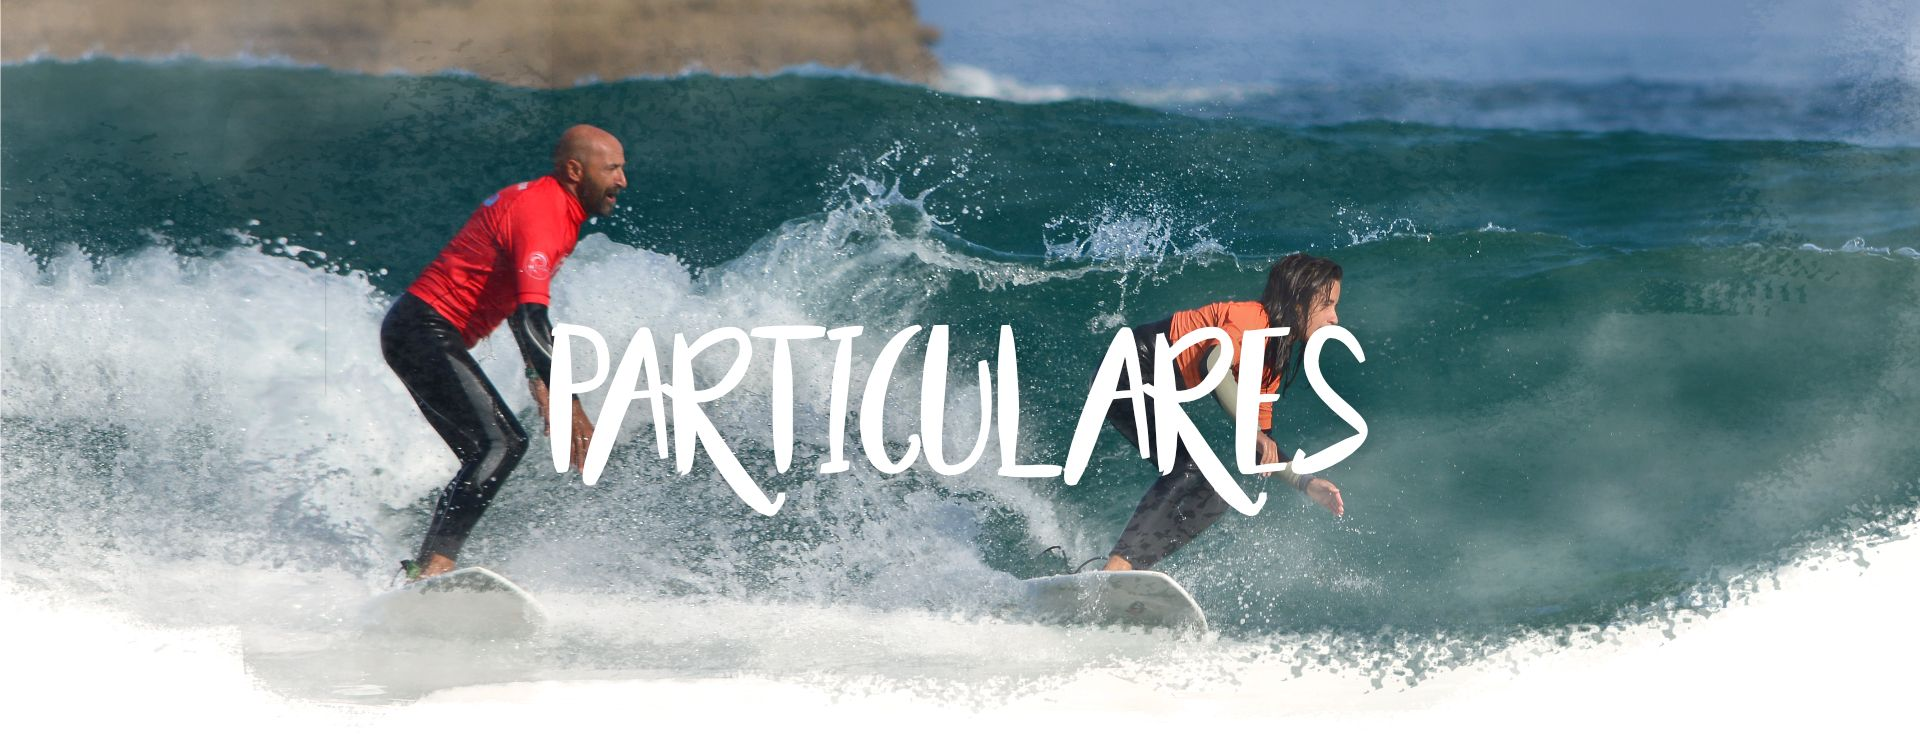 Cabecera clases de surf particulares